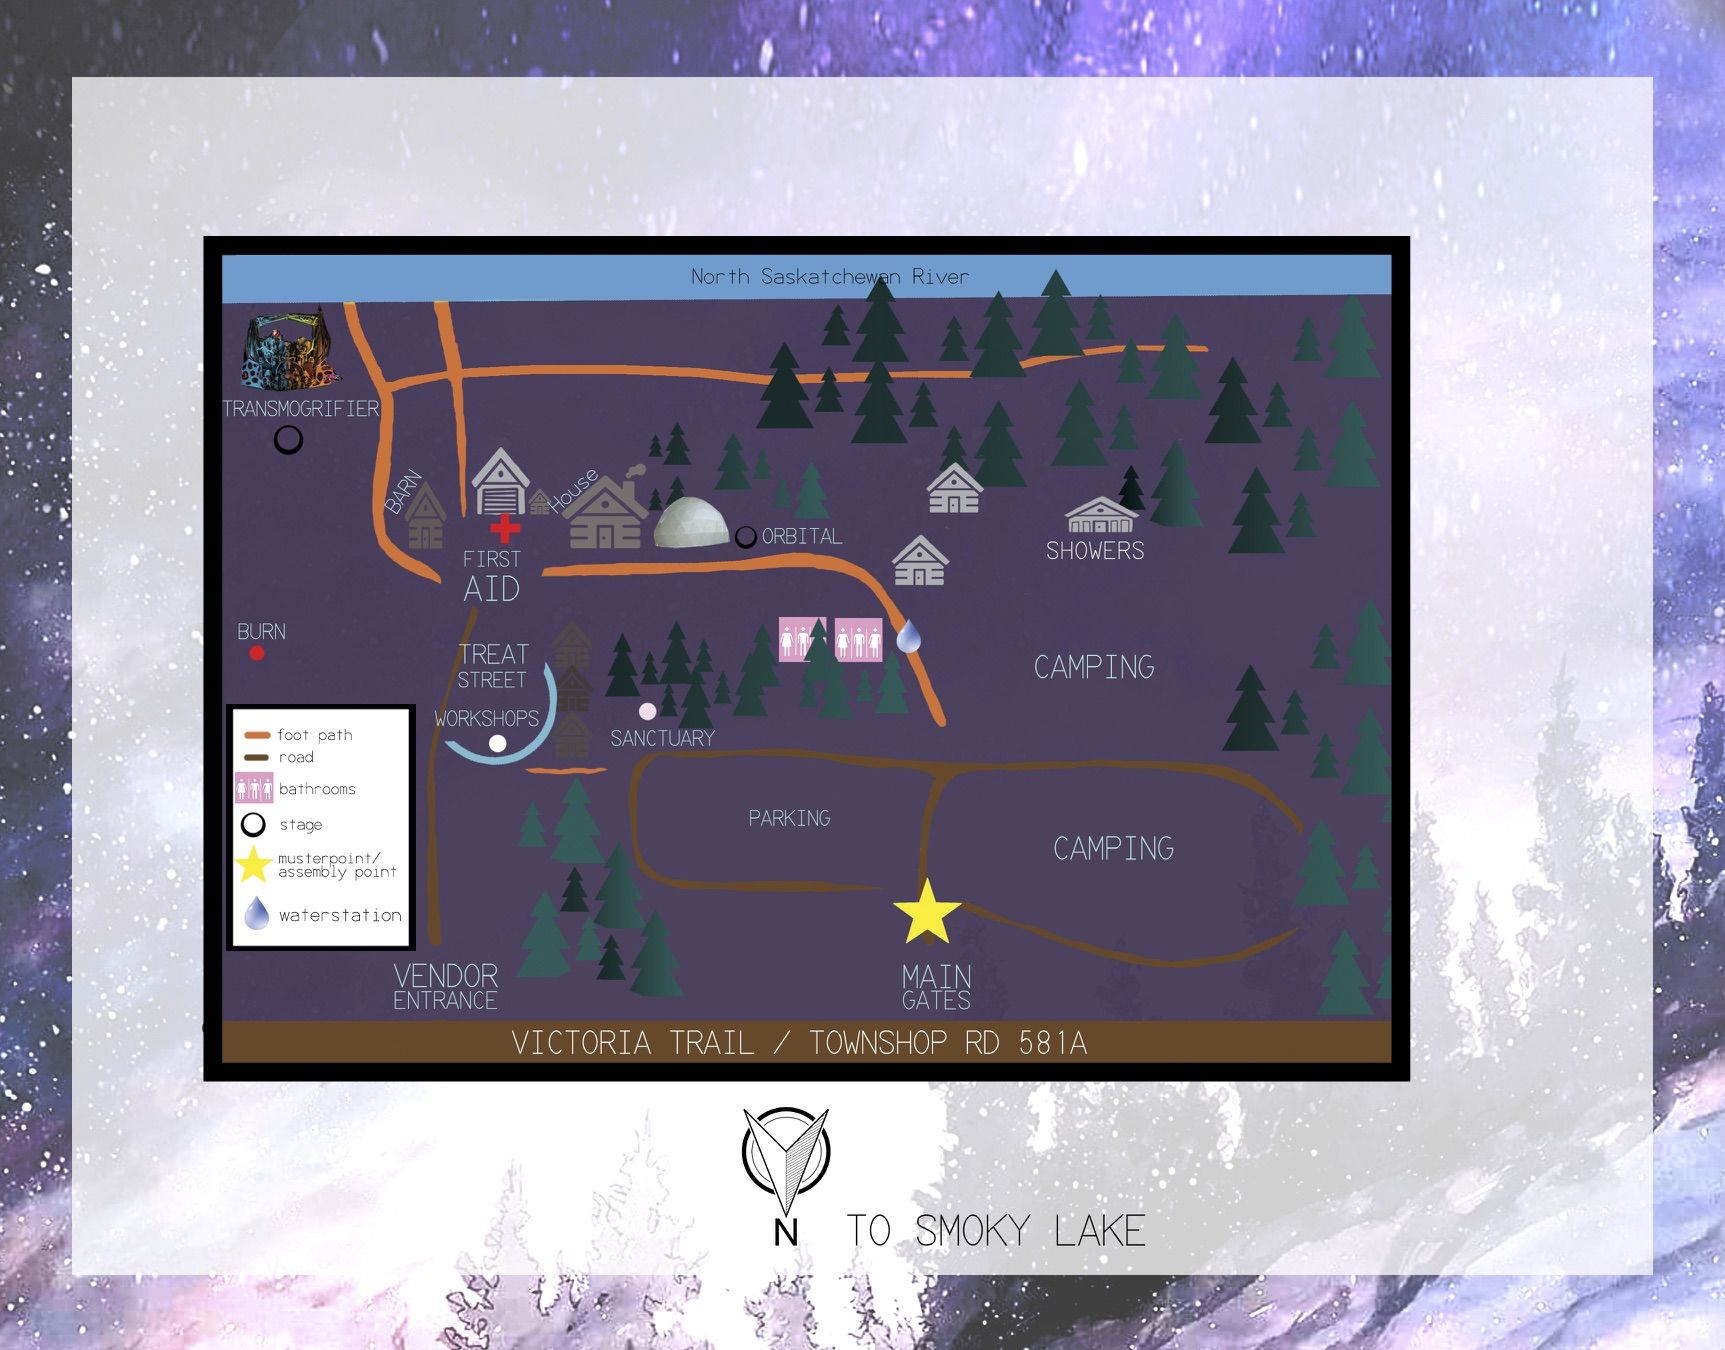 Odyssey Gathering 2018 MAP